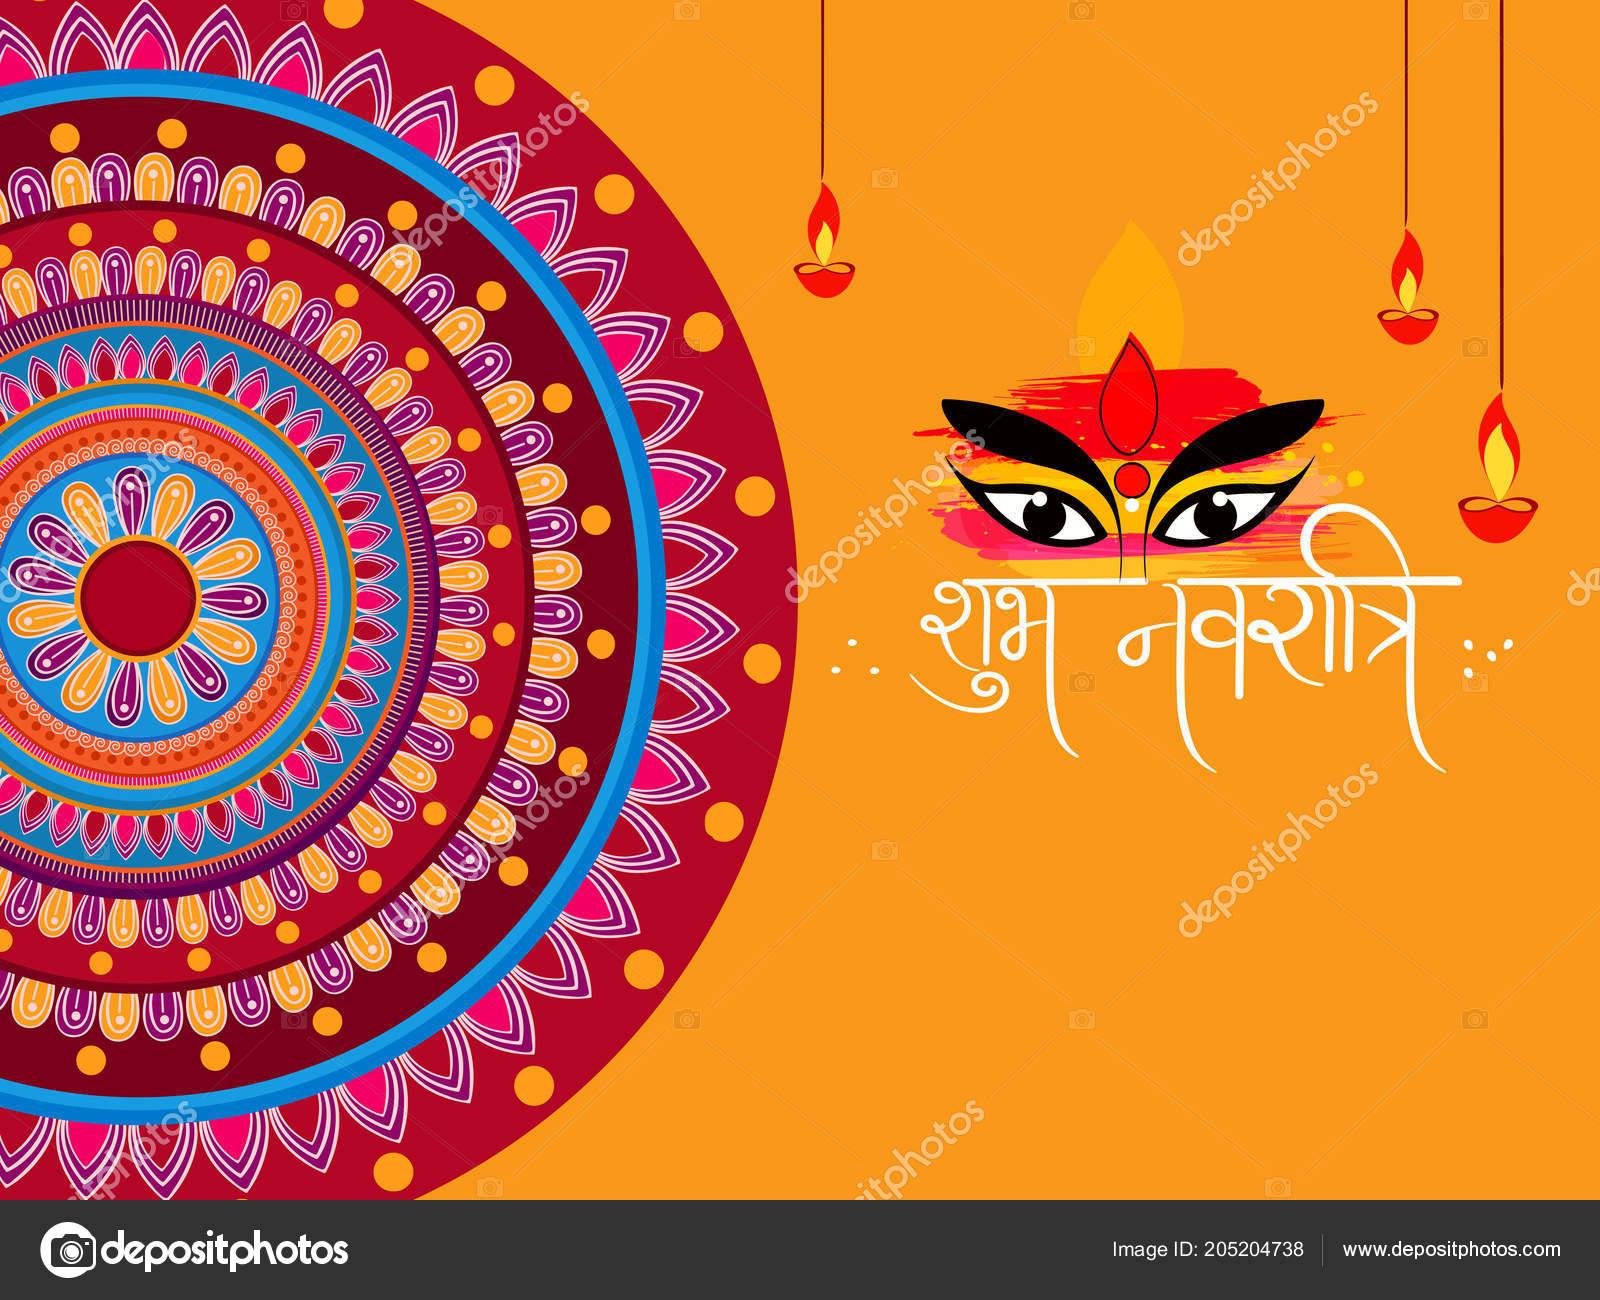 Abstract Editable Vector Hindu Festival Chaitra Navratri 2018